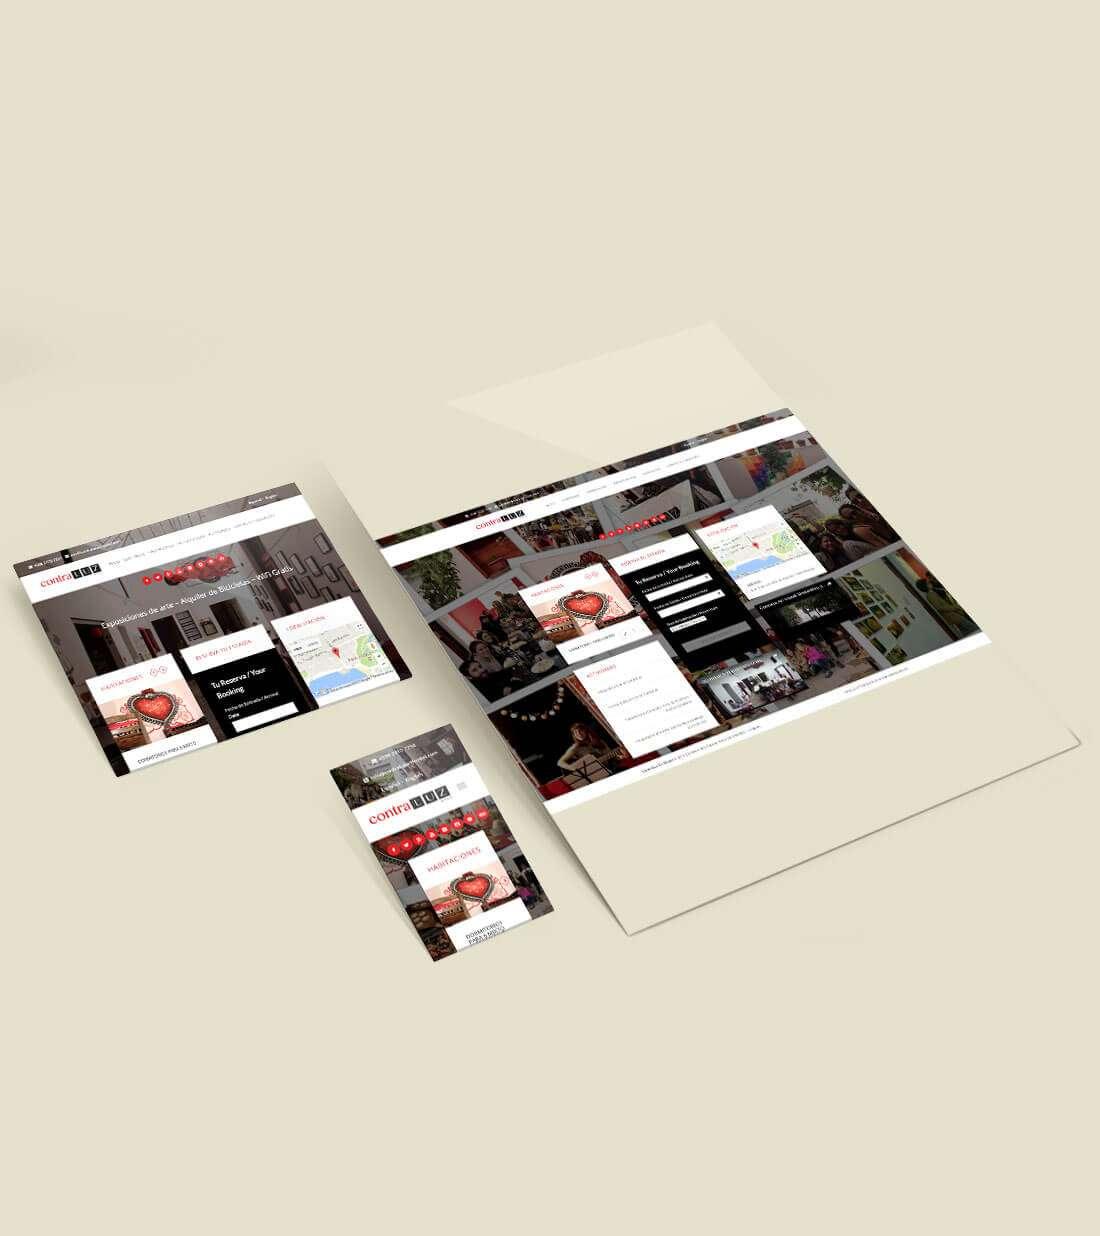 Contraluz Art Hostel. Website, responsive views